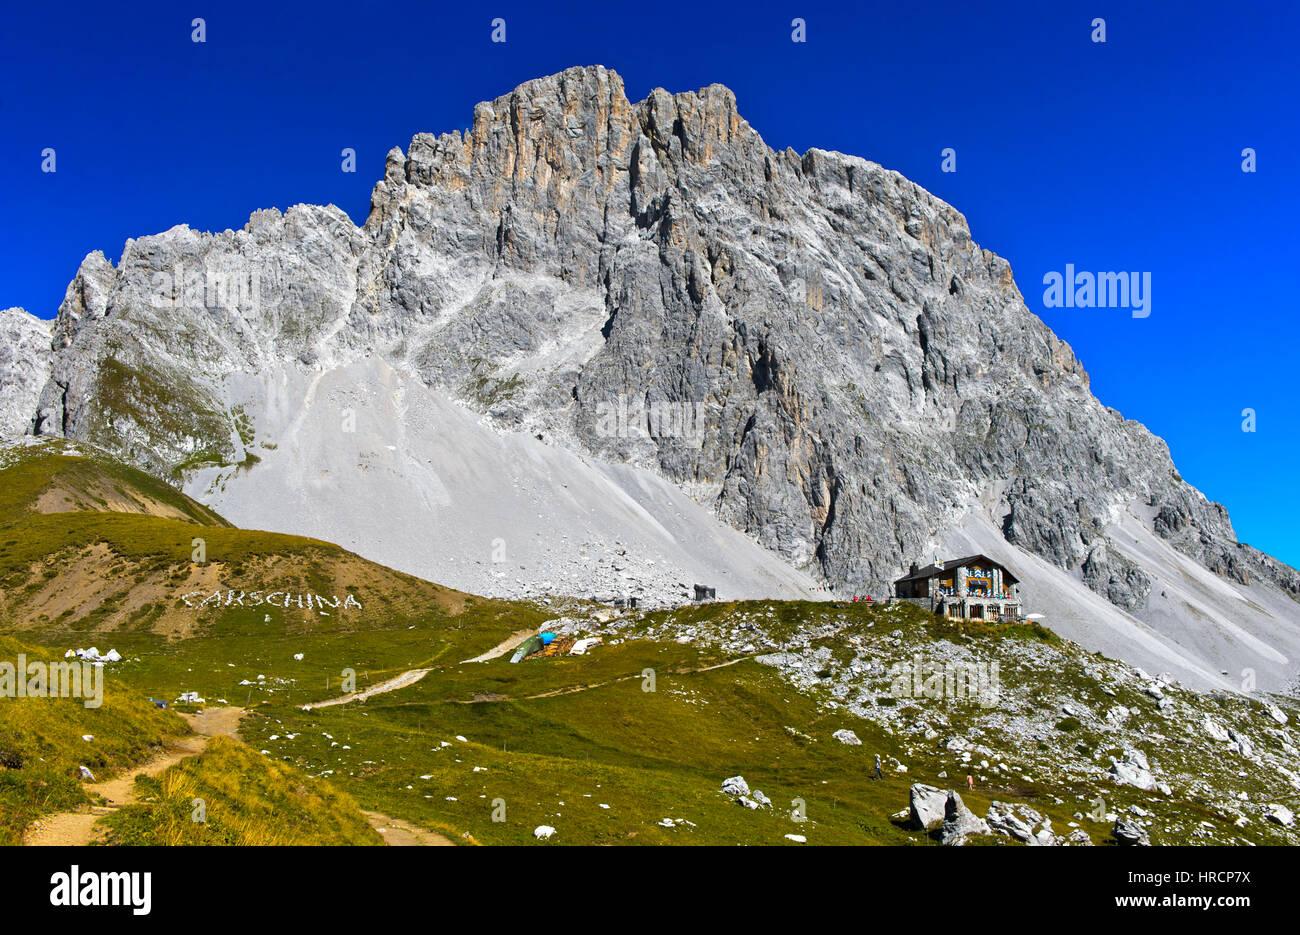 Mountain hut Carschinahütte, south face of the Sulzfluh peak, St. Antönien, Prättigau, Graubünden, - Stock Image